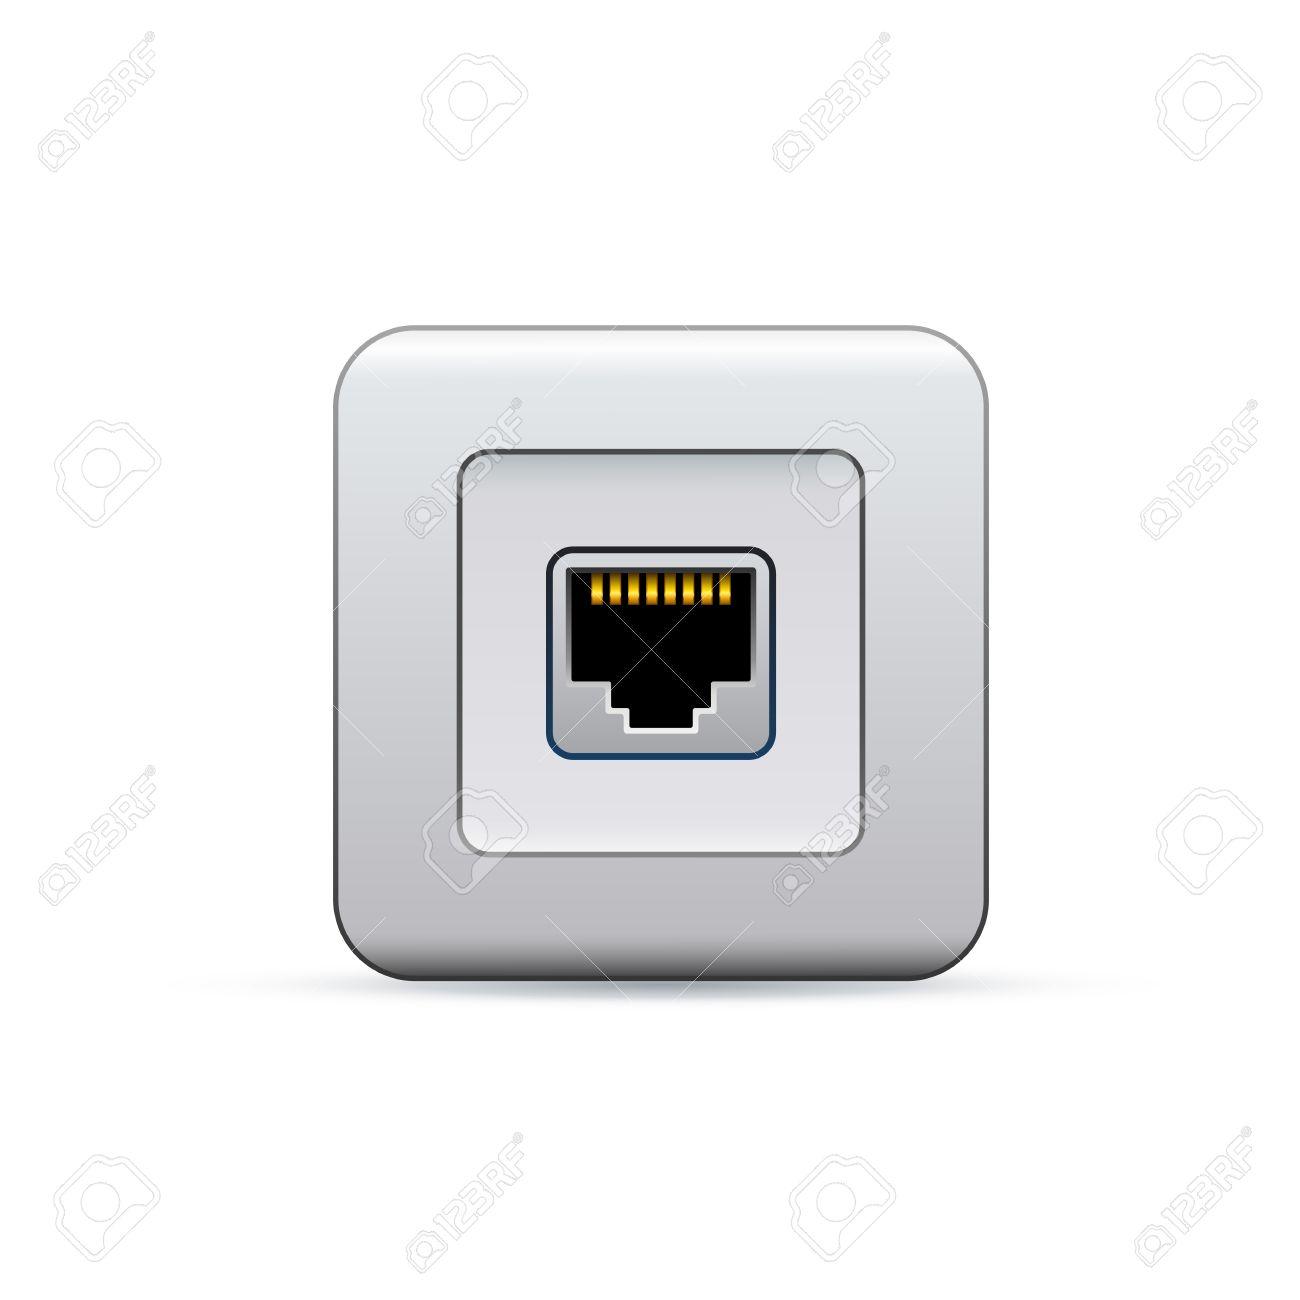 Mac g5 firewire symbol dolgular beautiful firewire cable symbol gallery electrical and wiring buycottarizona